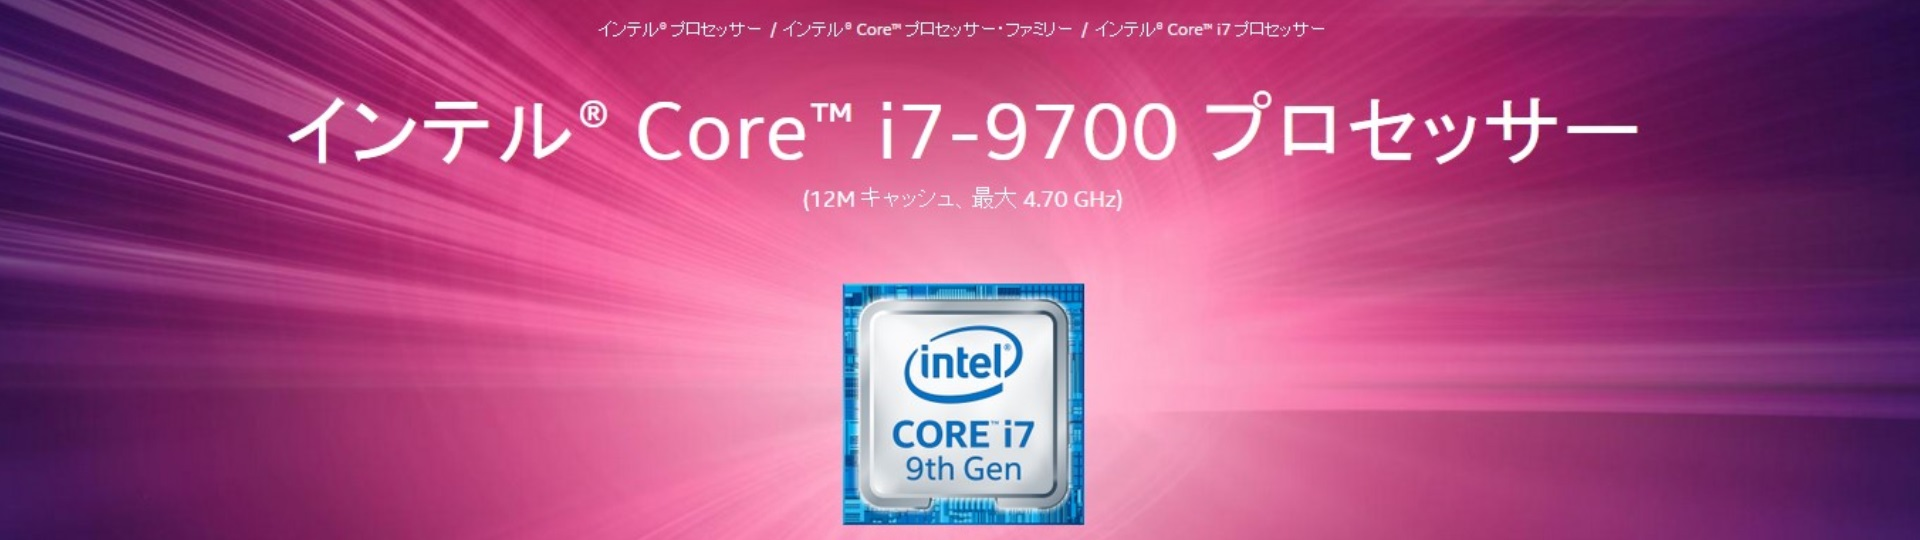 AviUtlにオススメPCスペック:CPUはi7-9700